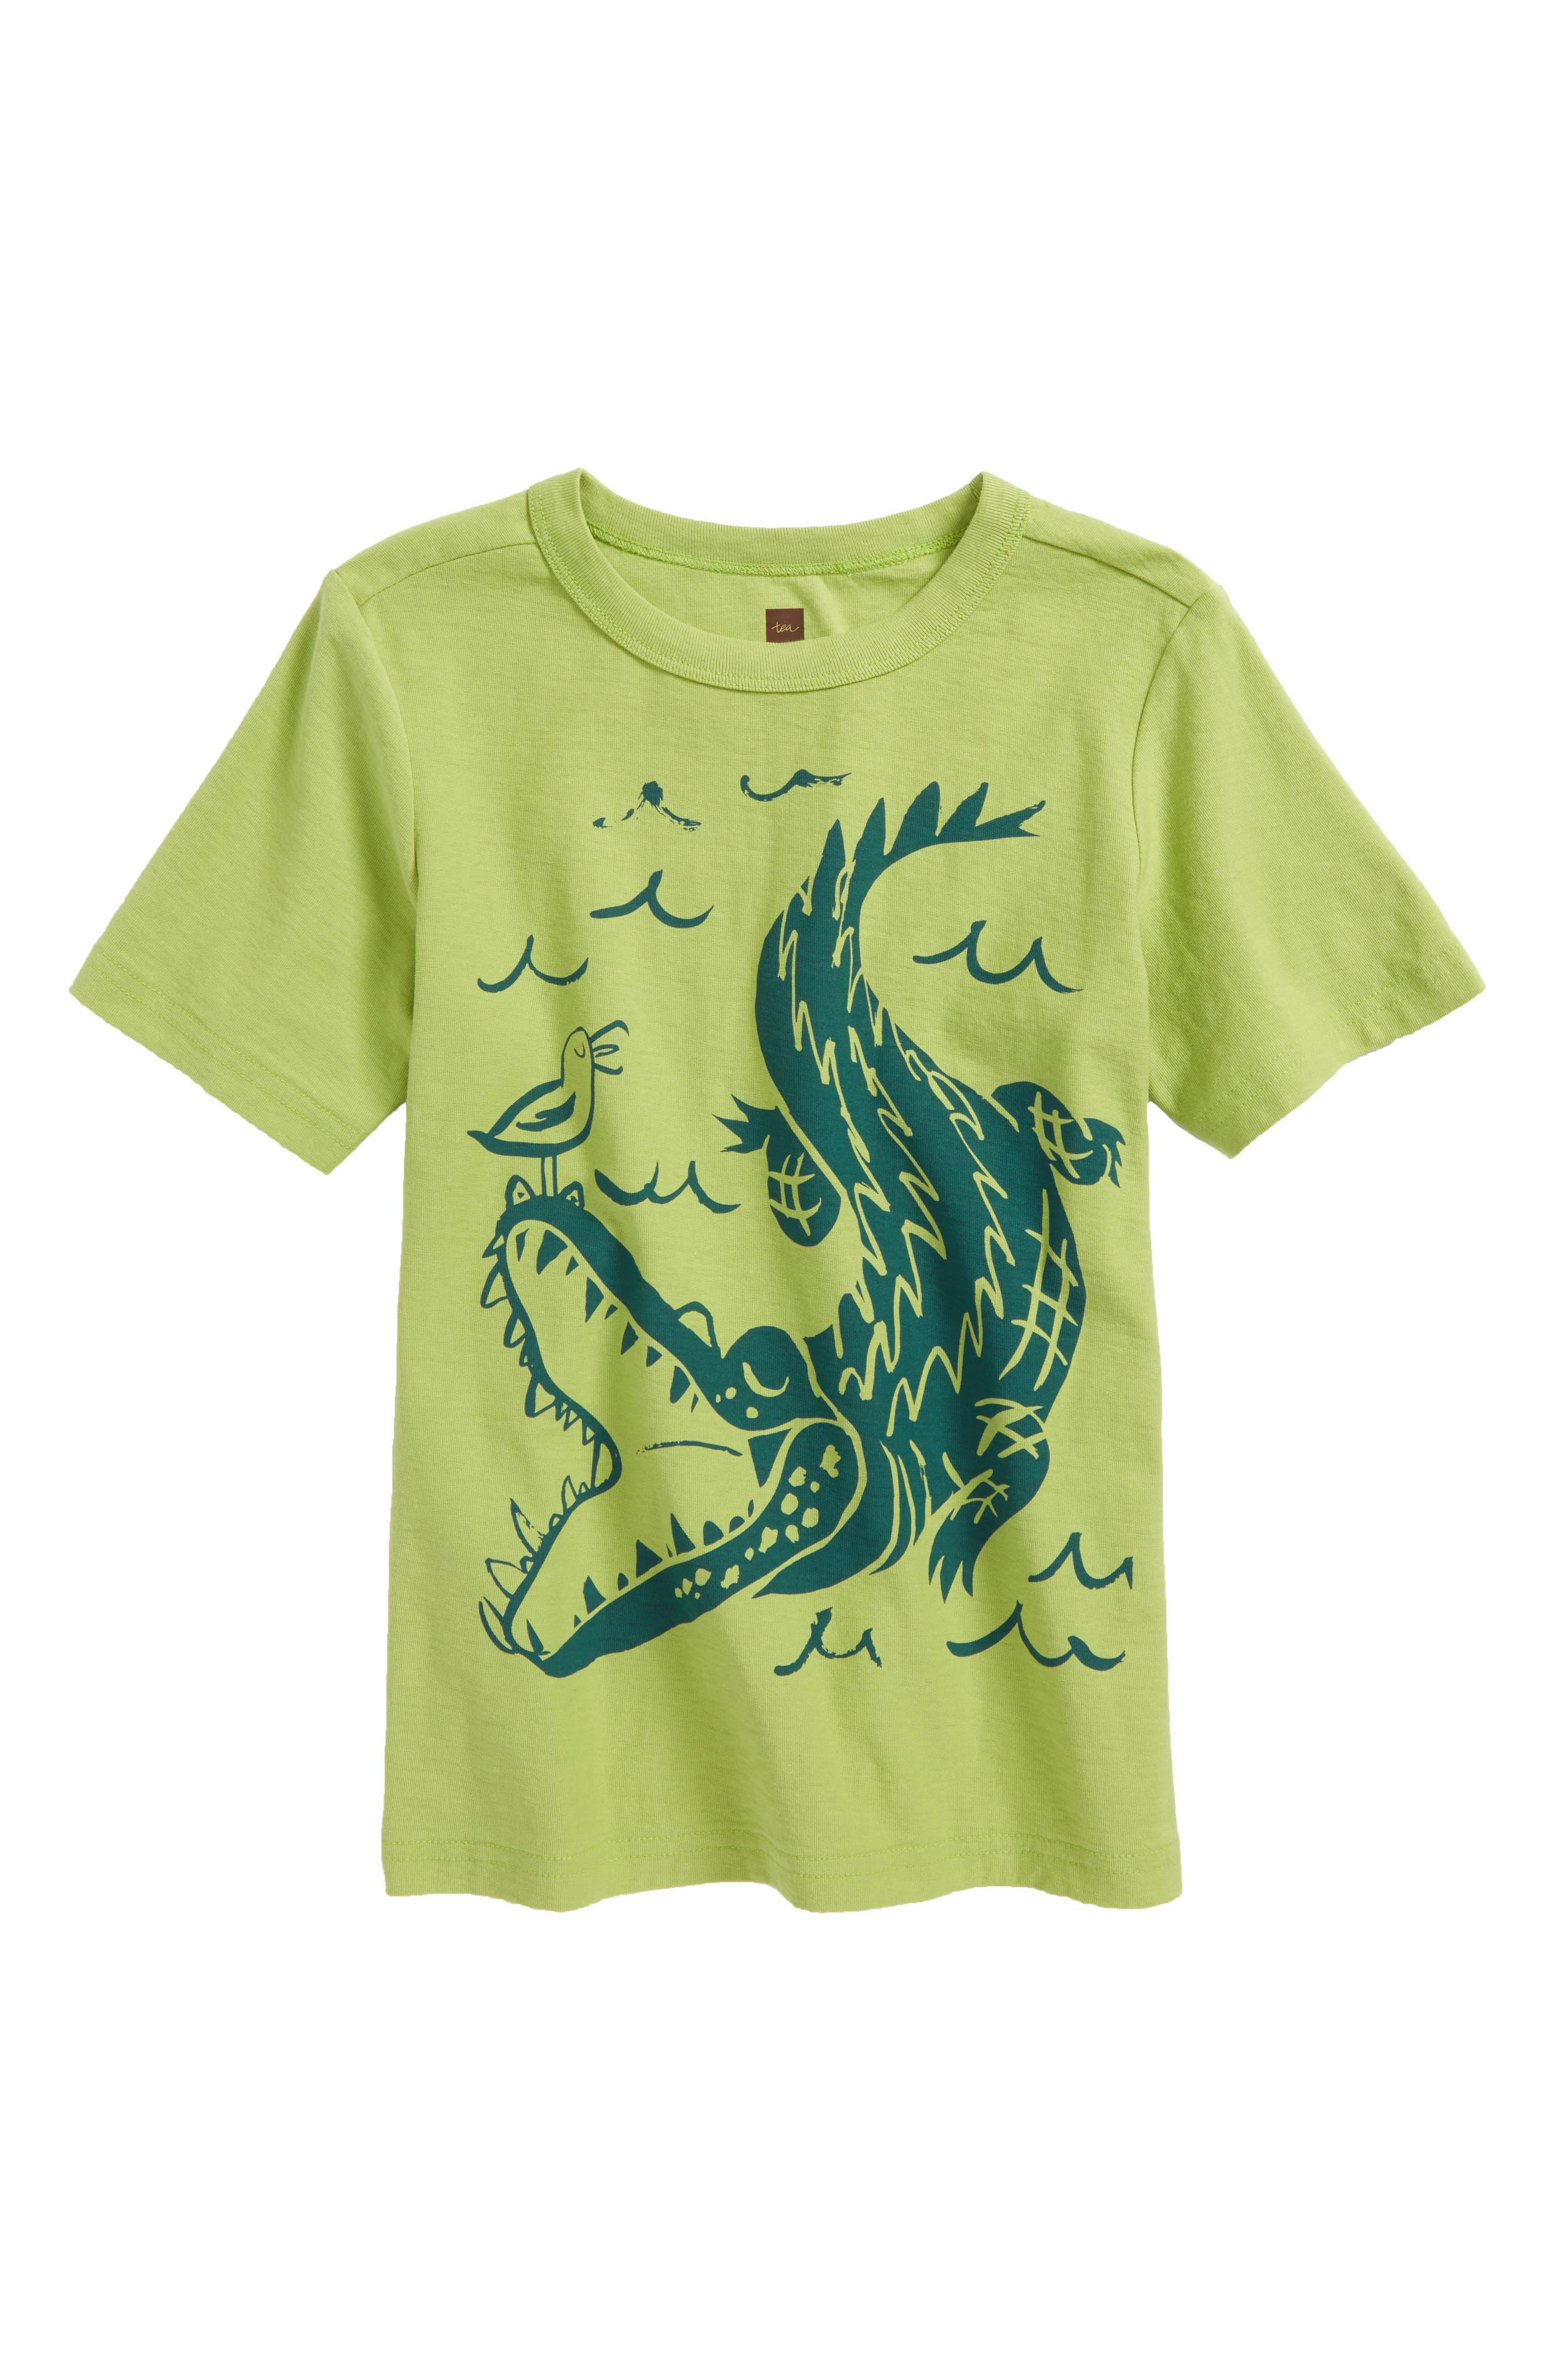 Alligator T-Shirt,                         Main,                         color, 372